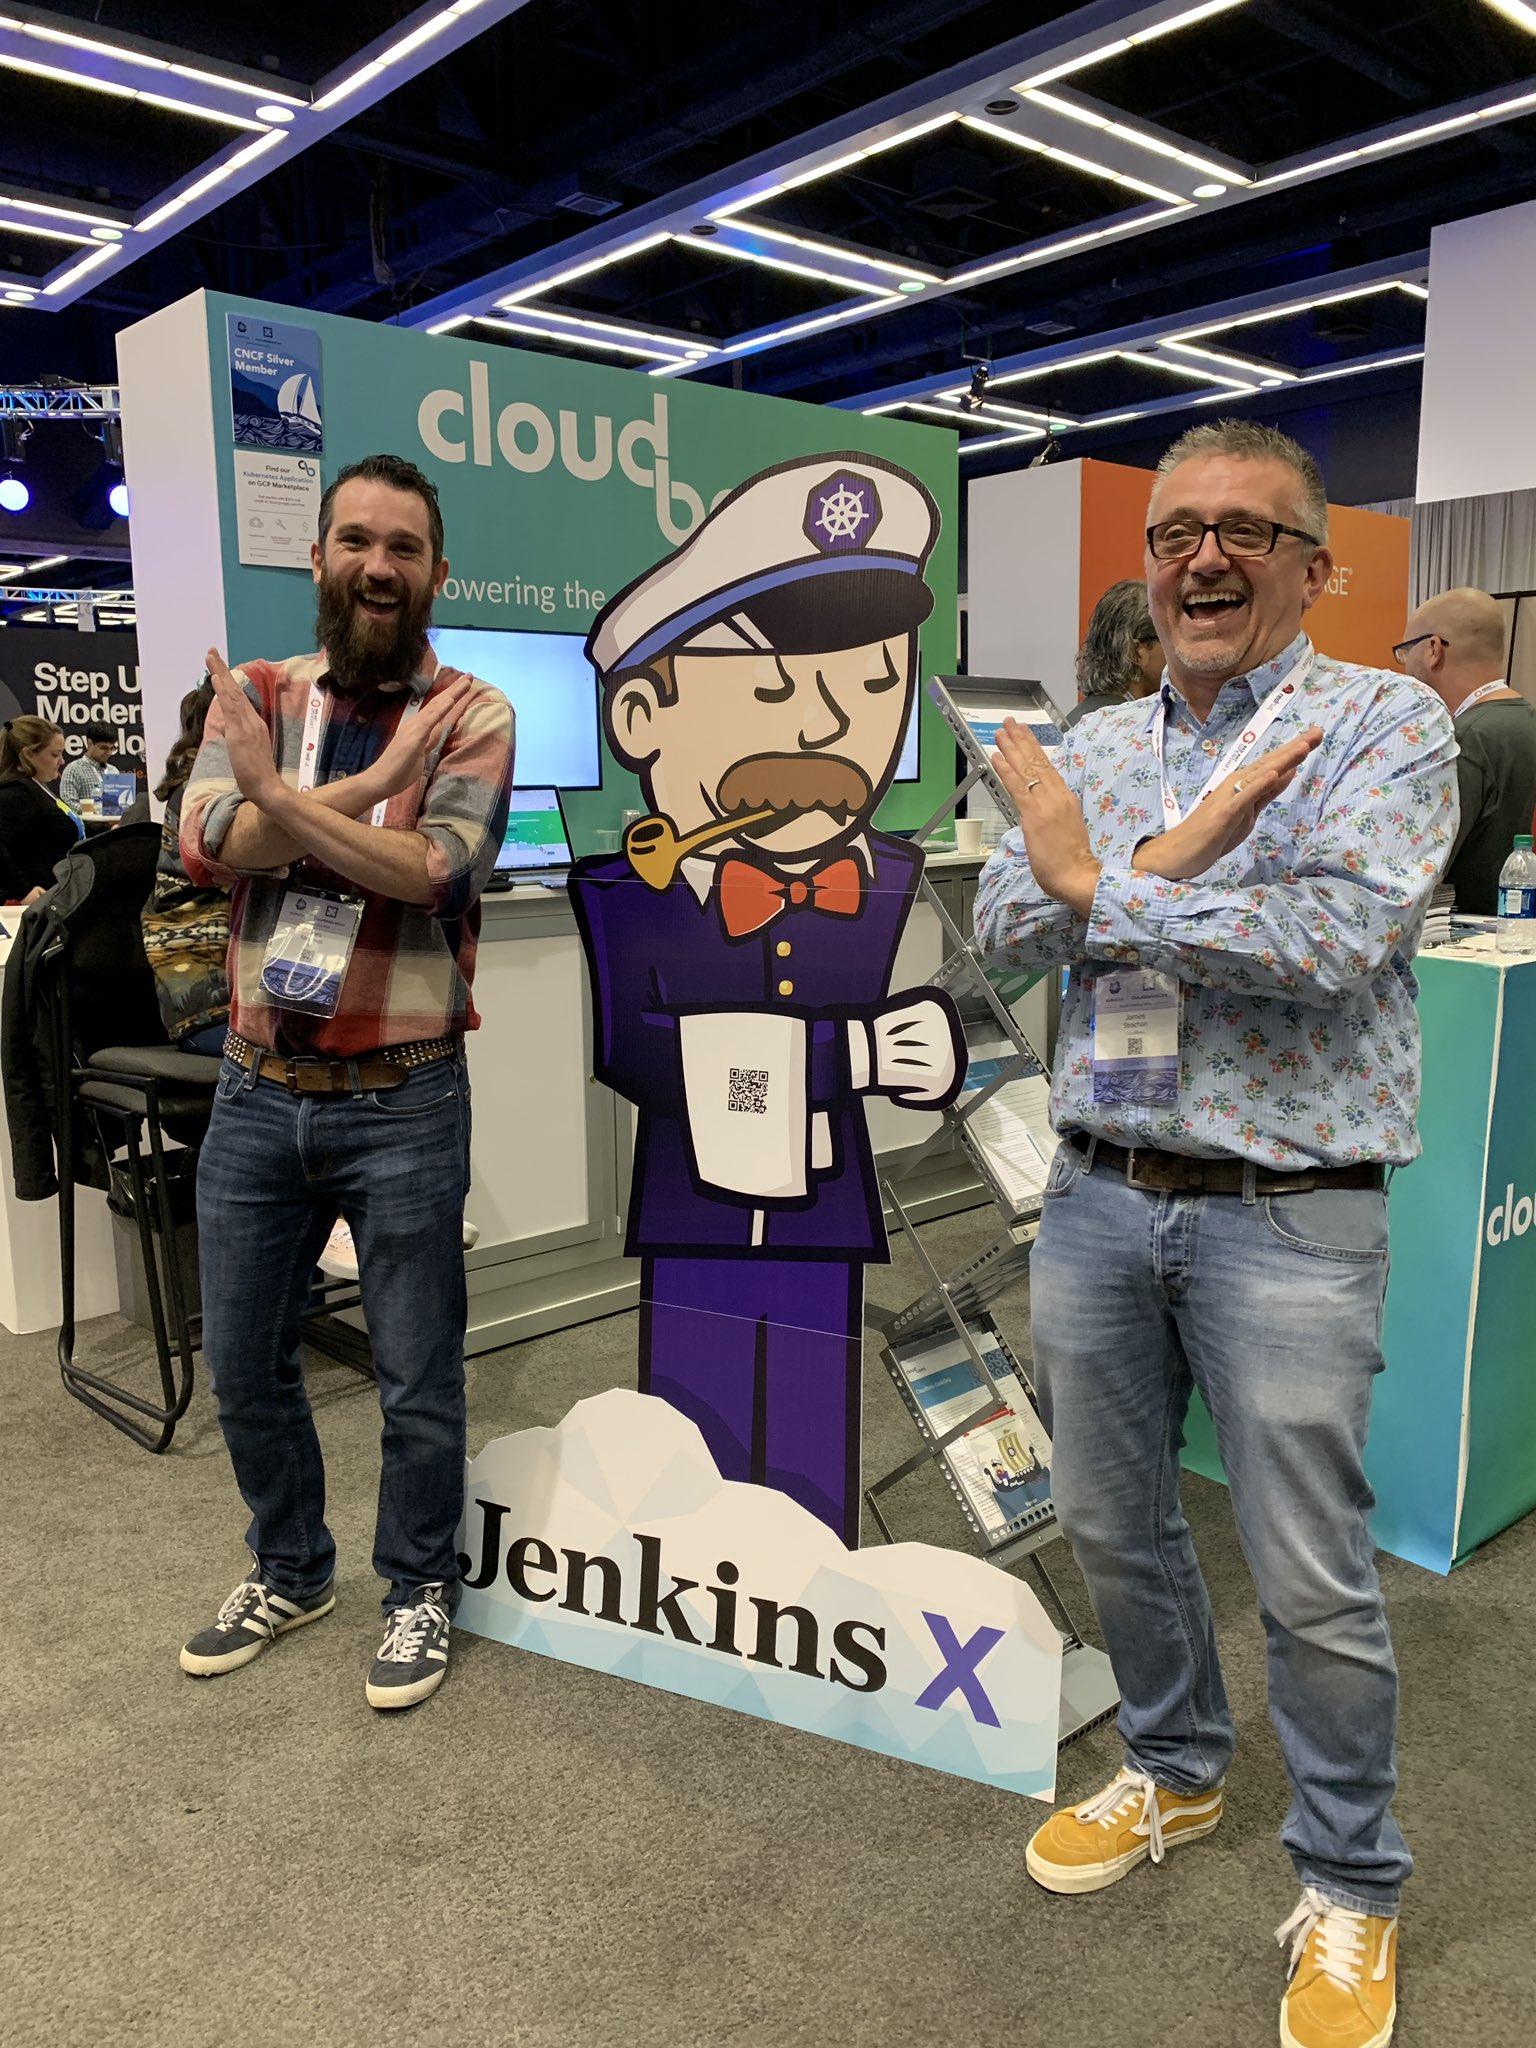 Merry Jenkins X Mas! | Jenkins X